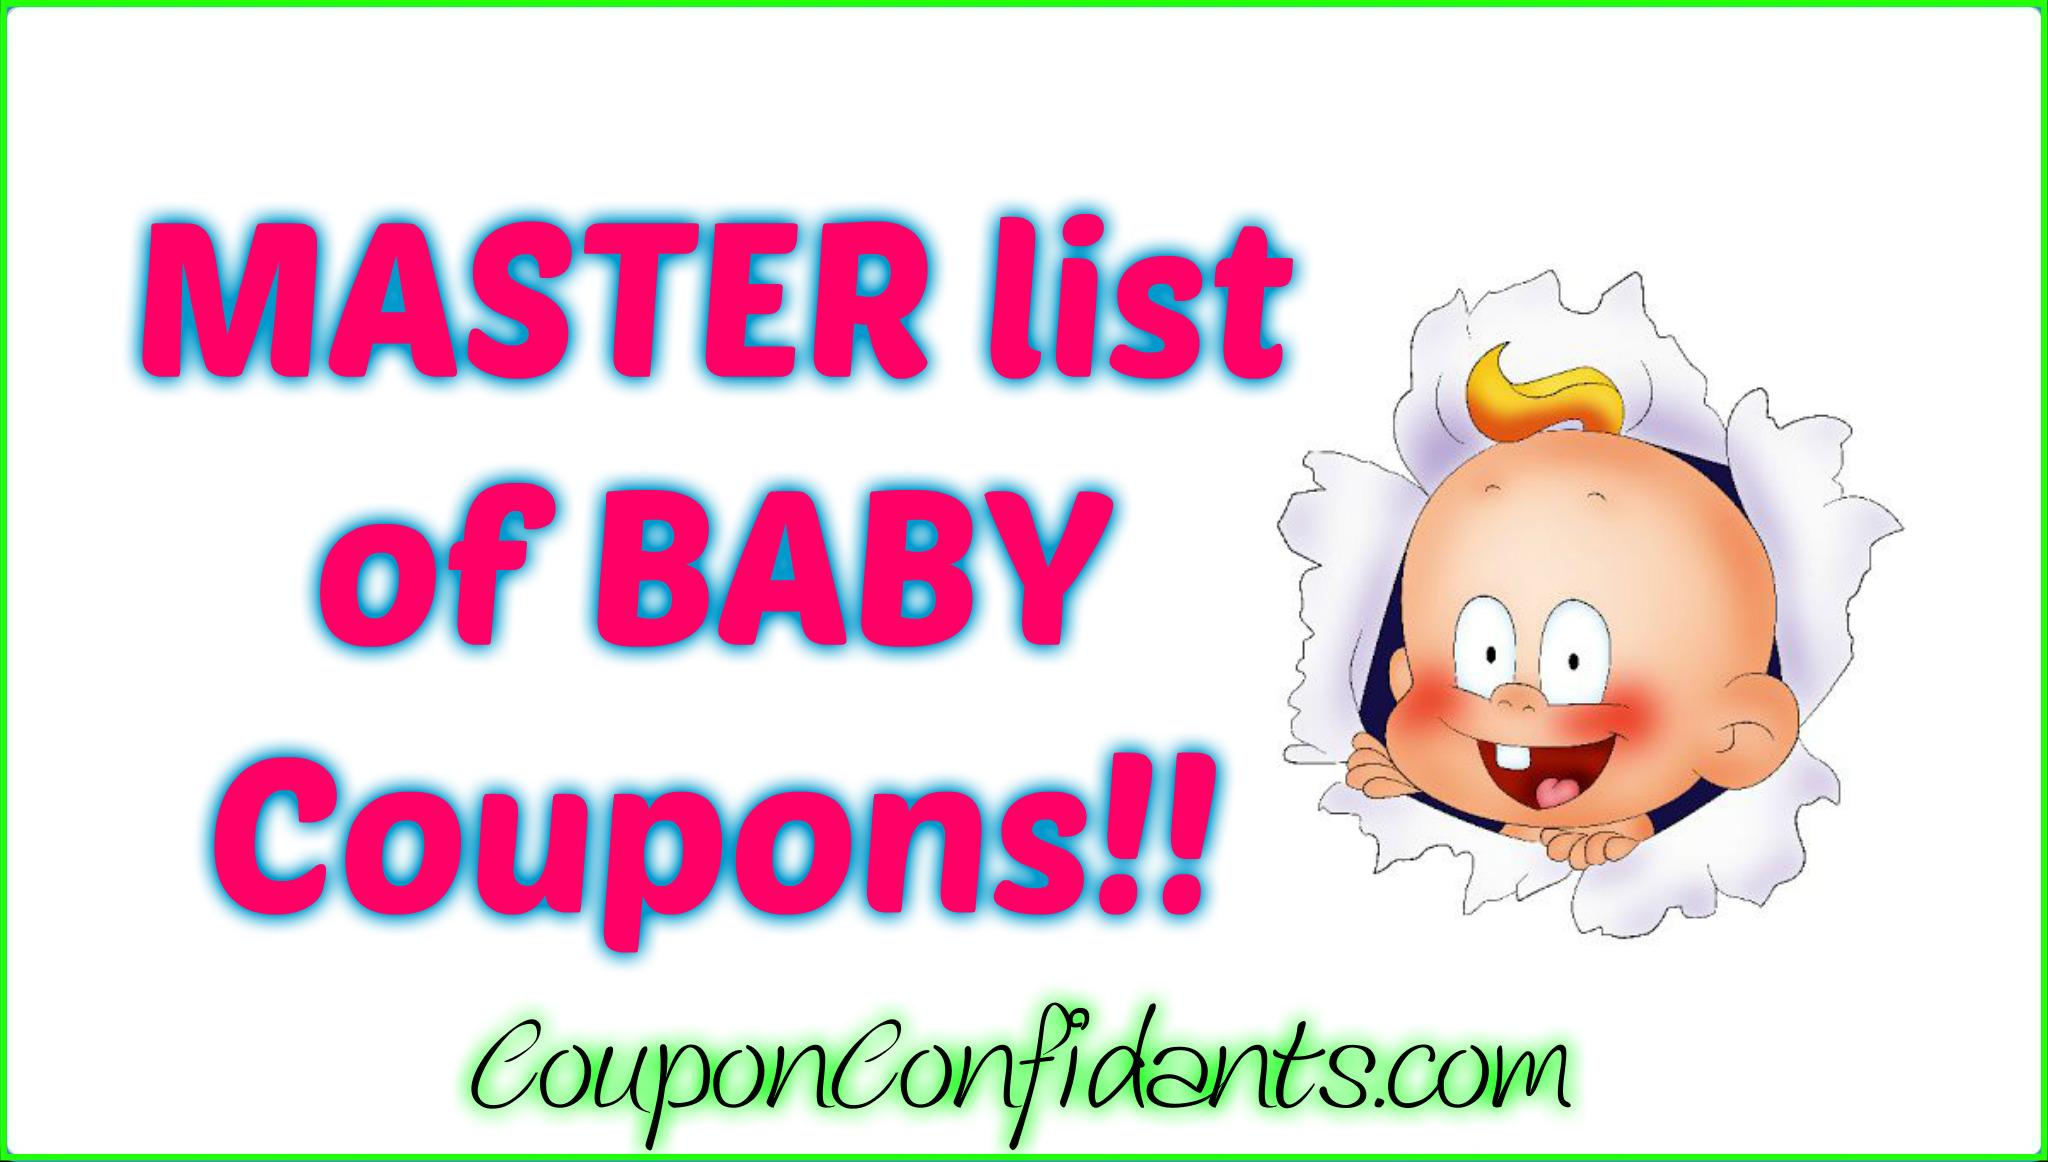 Target baby coupon code